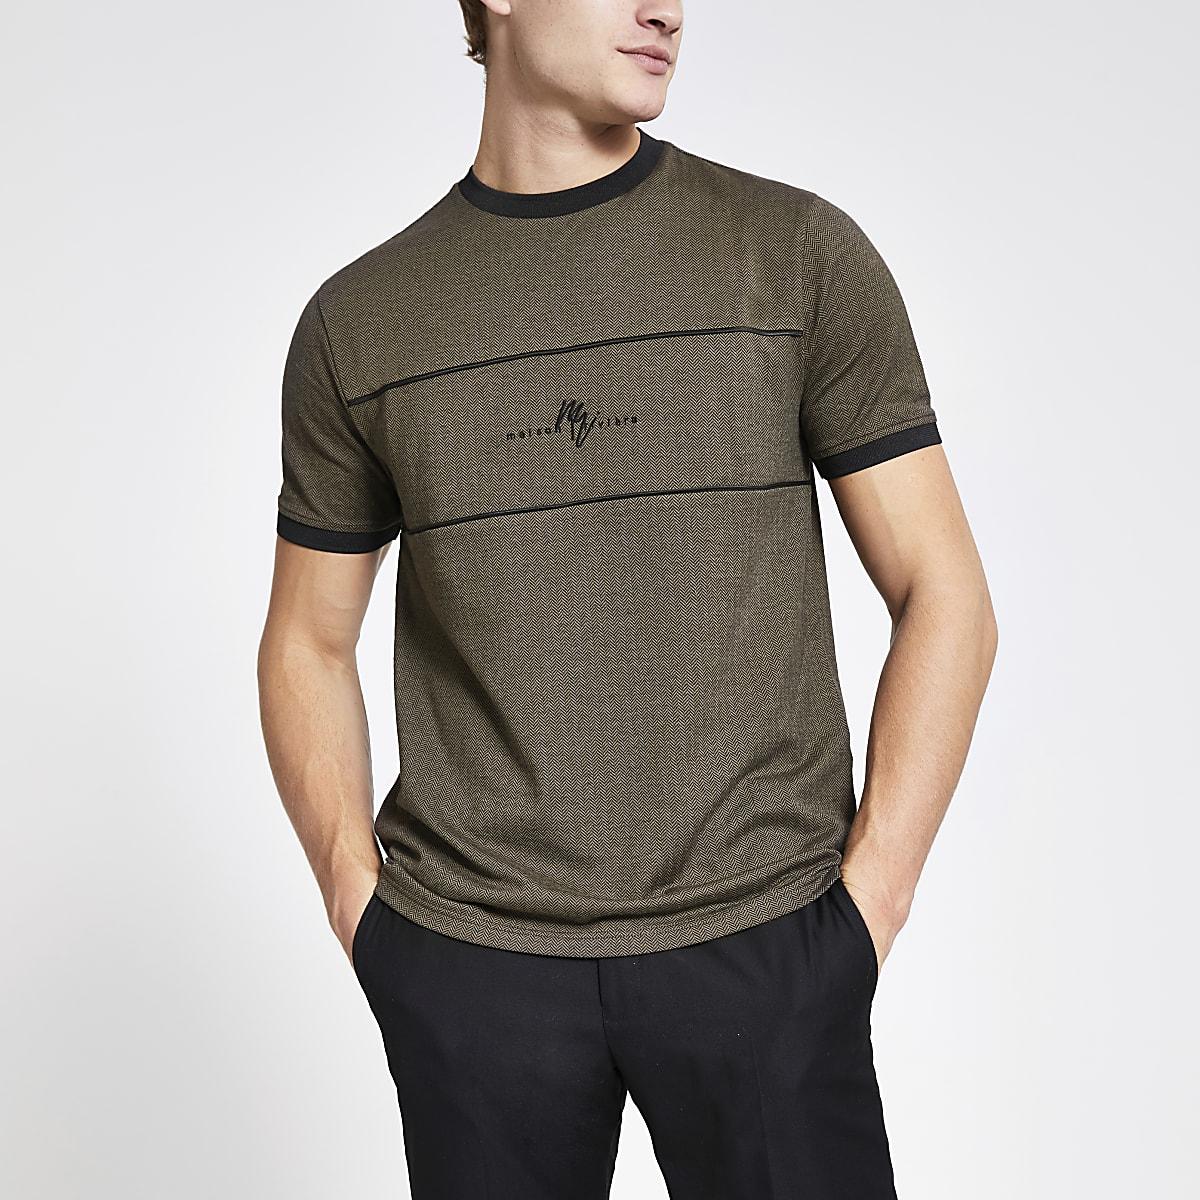 Khaki Maison Riviera slim fit T-shirt